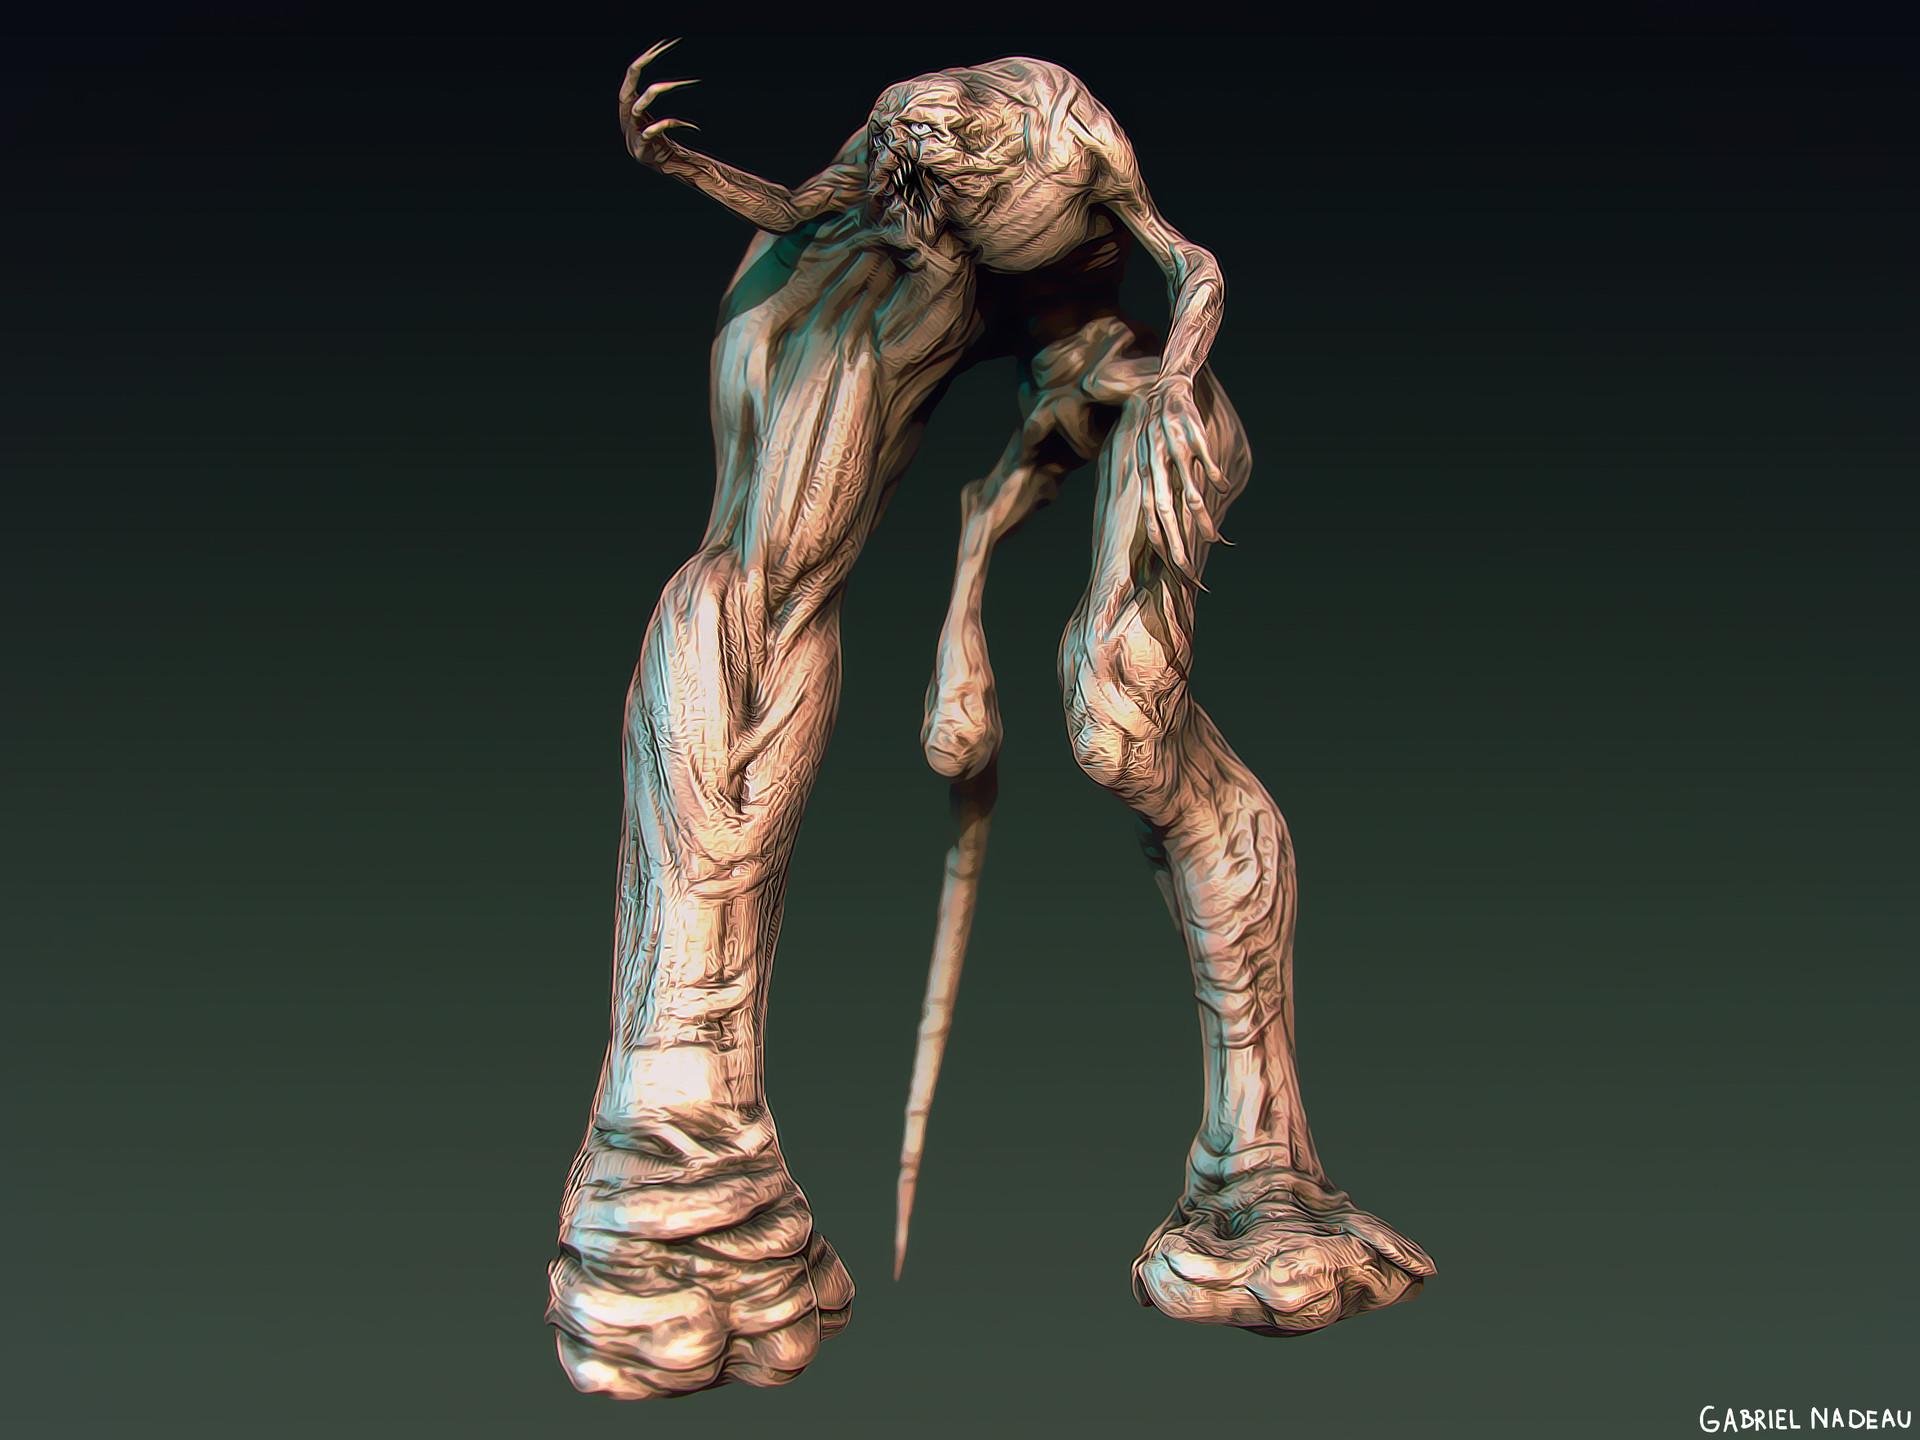 Gabriel nadeau monstre 2